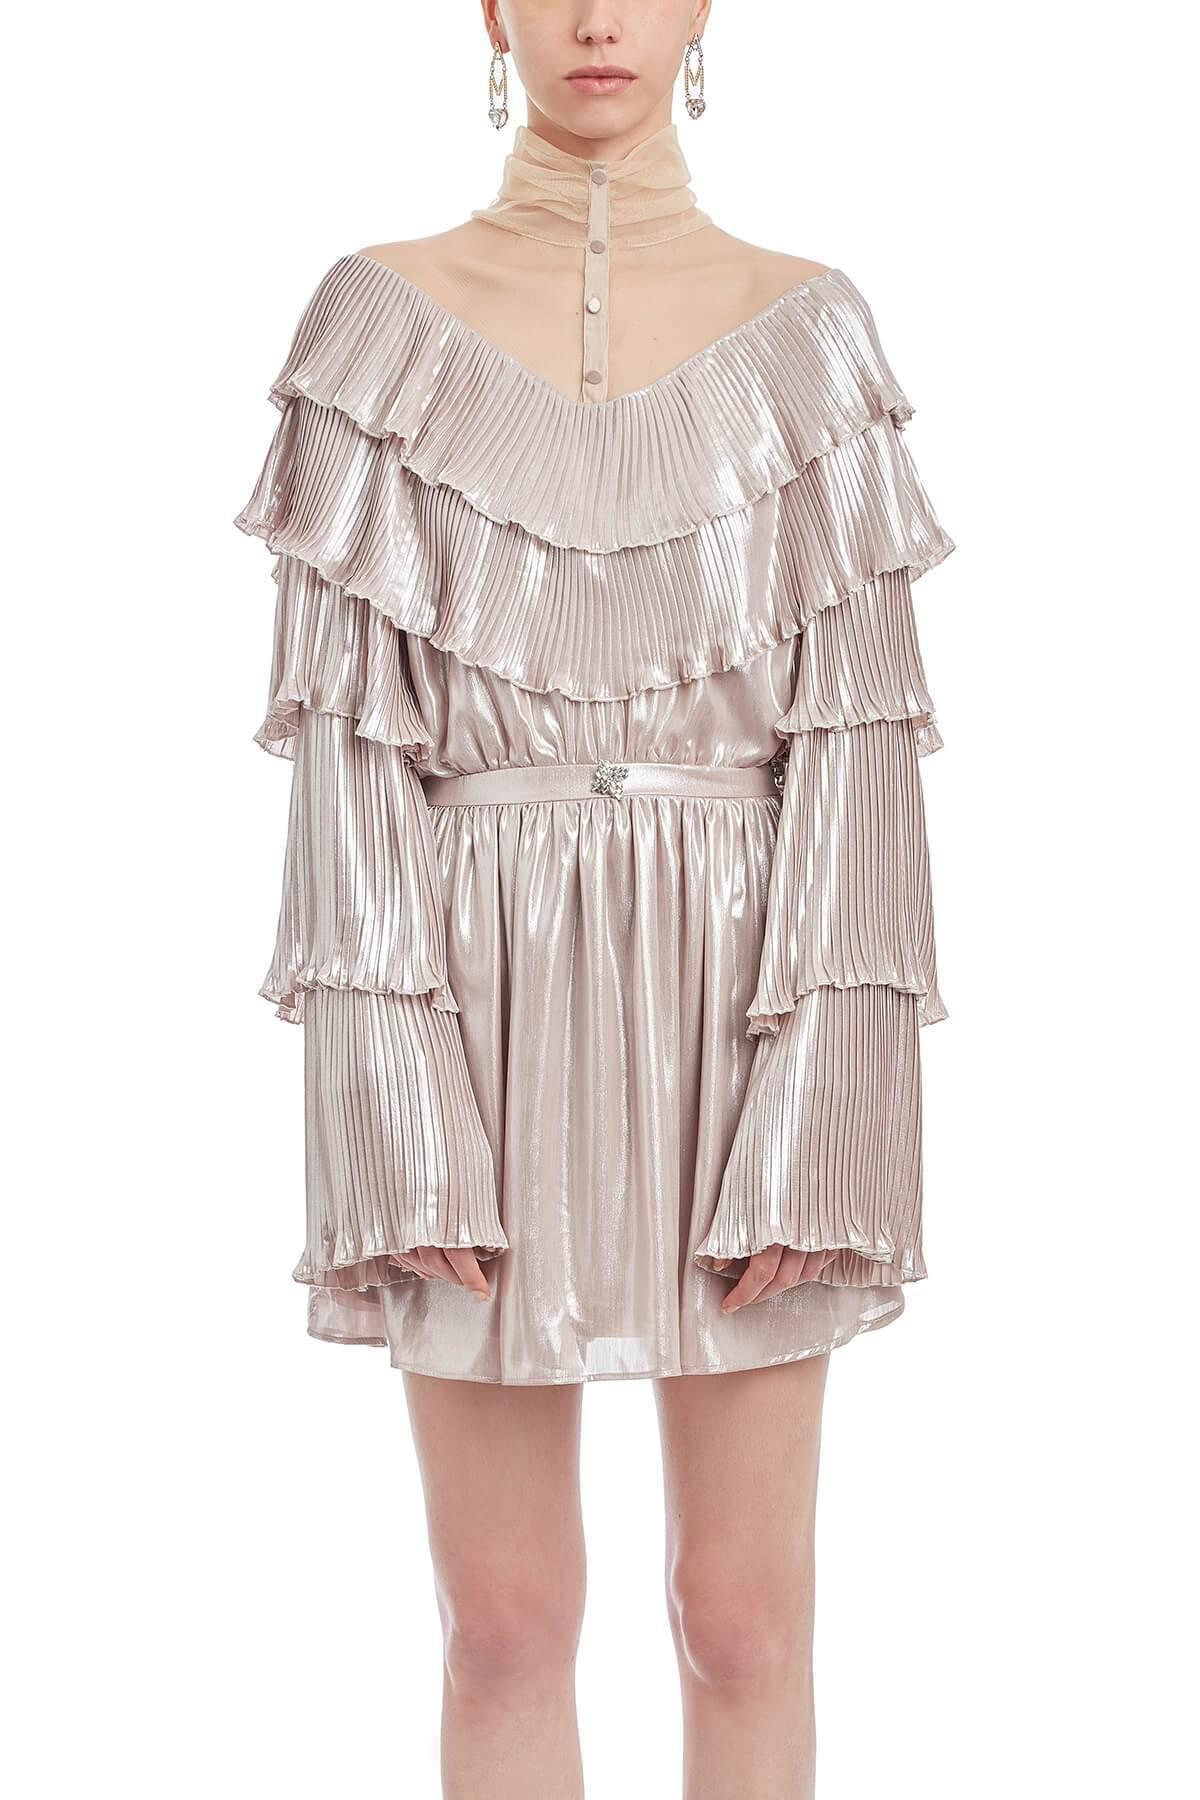 Buy Powder Pink Julia Lam?ini Dress online, shop Amotea with free shipping